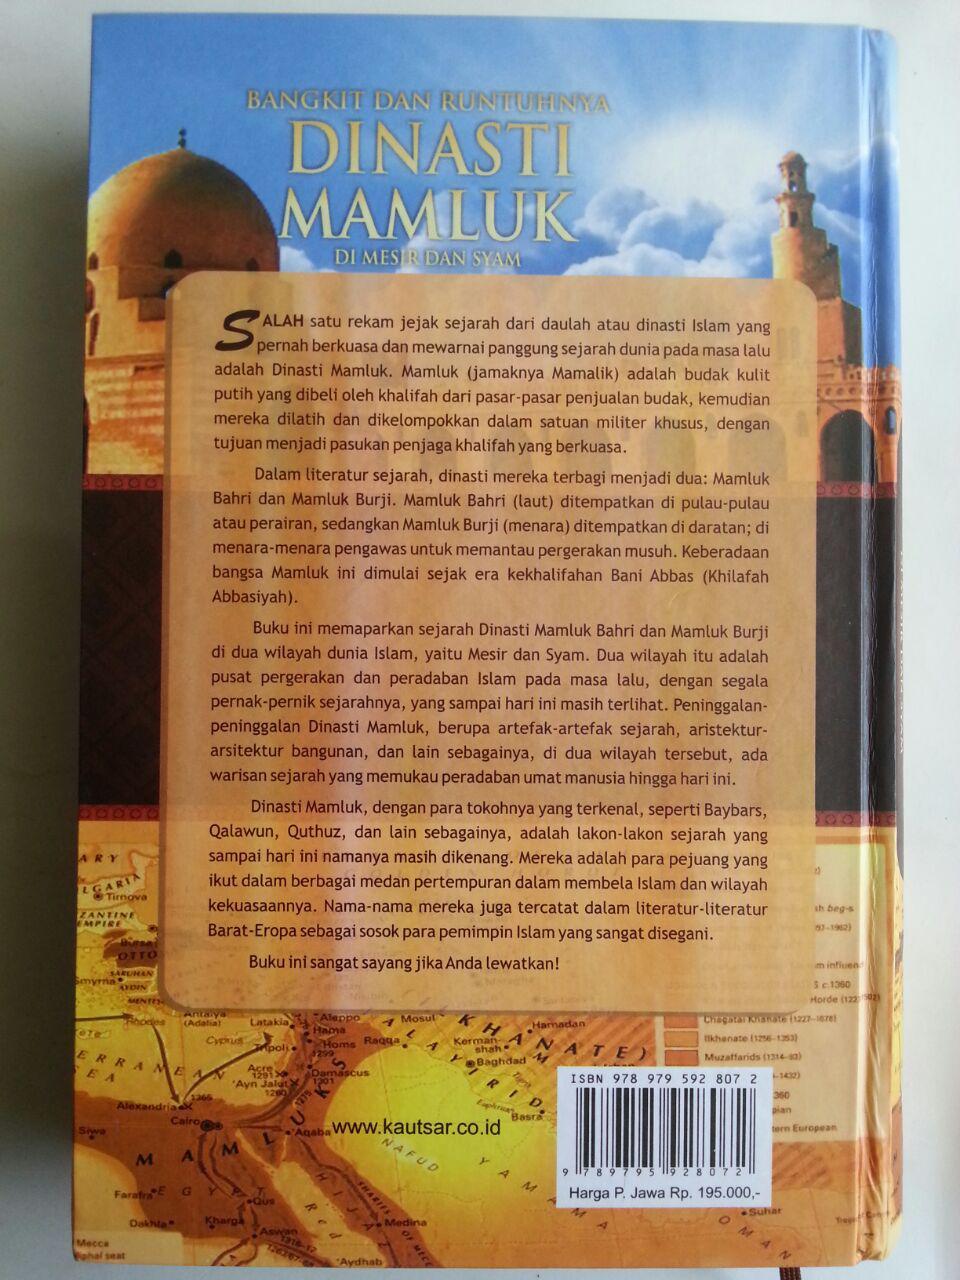 Buku Bangkit Dan Runtuhnya Dinasti Mamluk Di Mesir Dan Syam cover